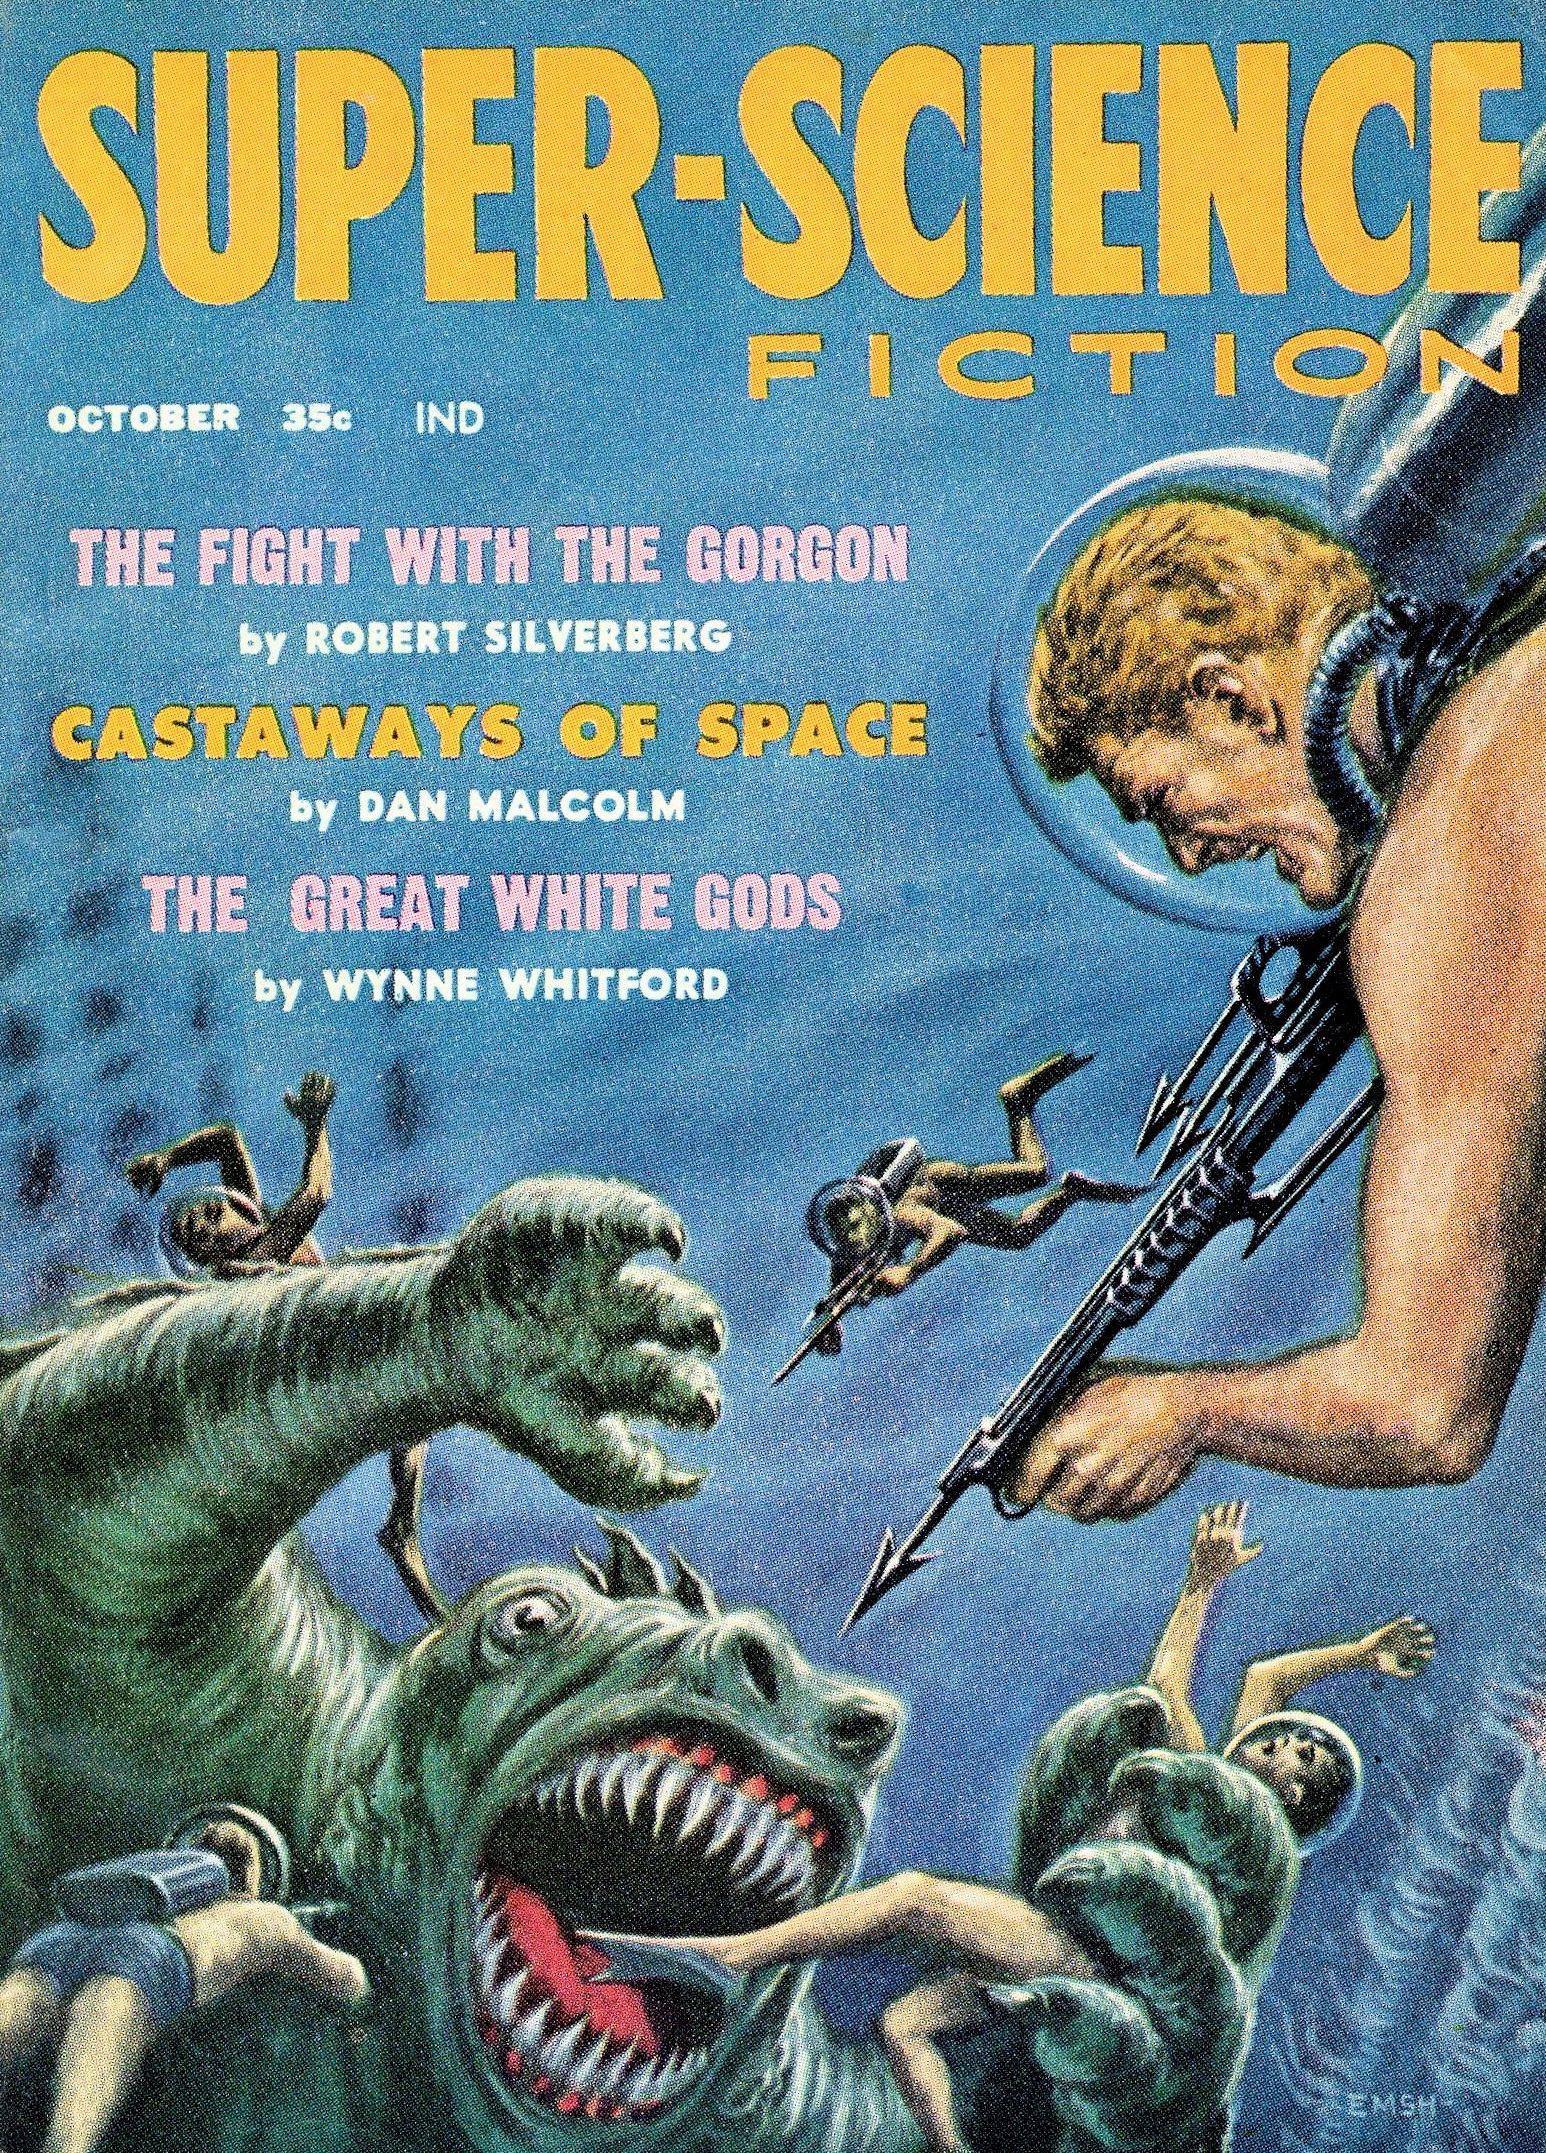 Super Science Fiction October 1958